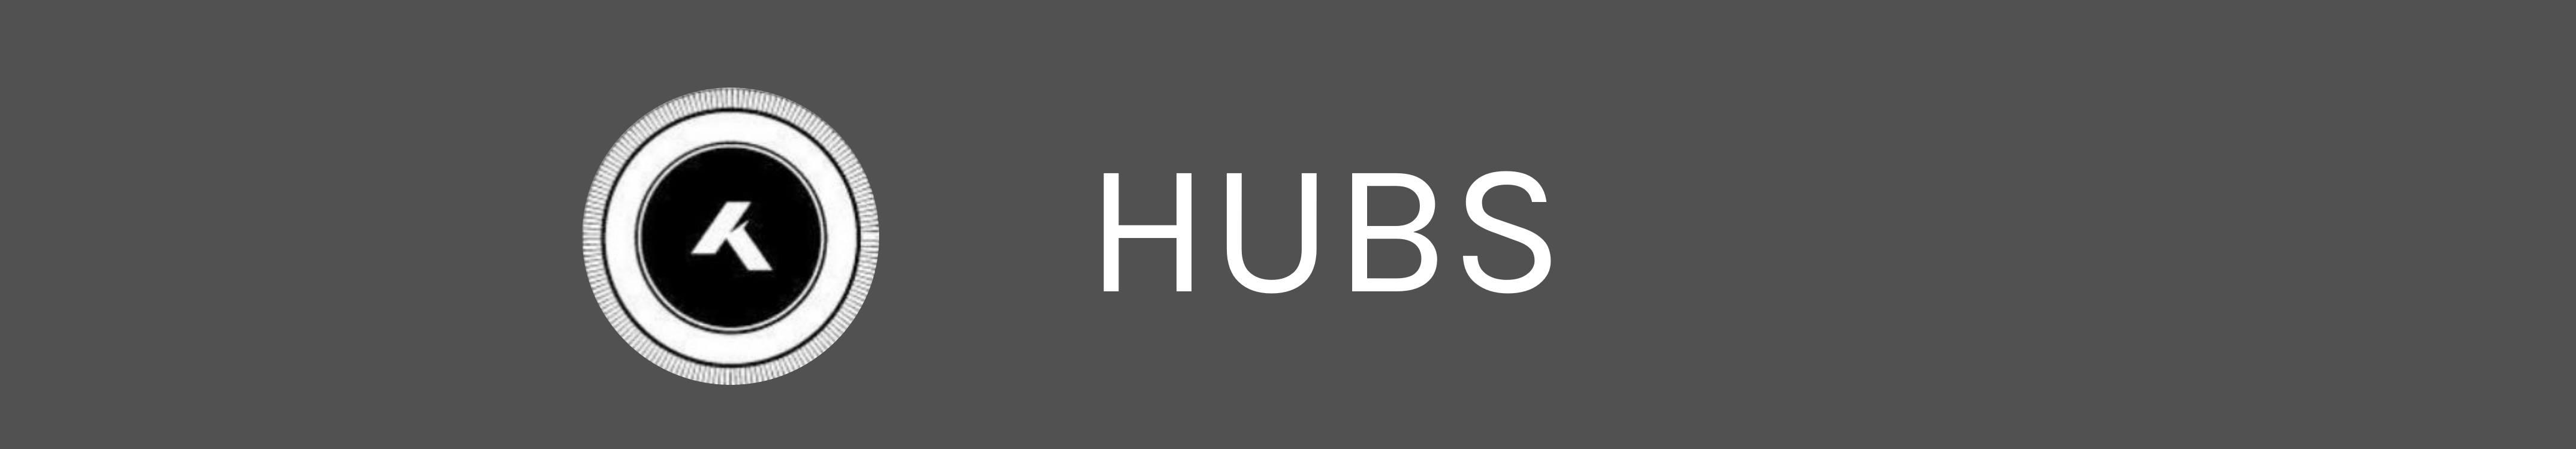 KHE-Banner-HubsEHjQW3jrXLzfV